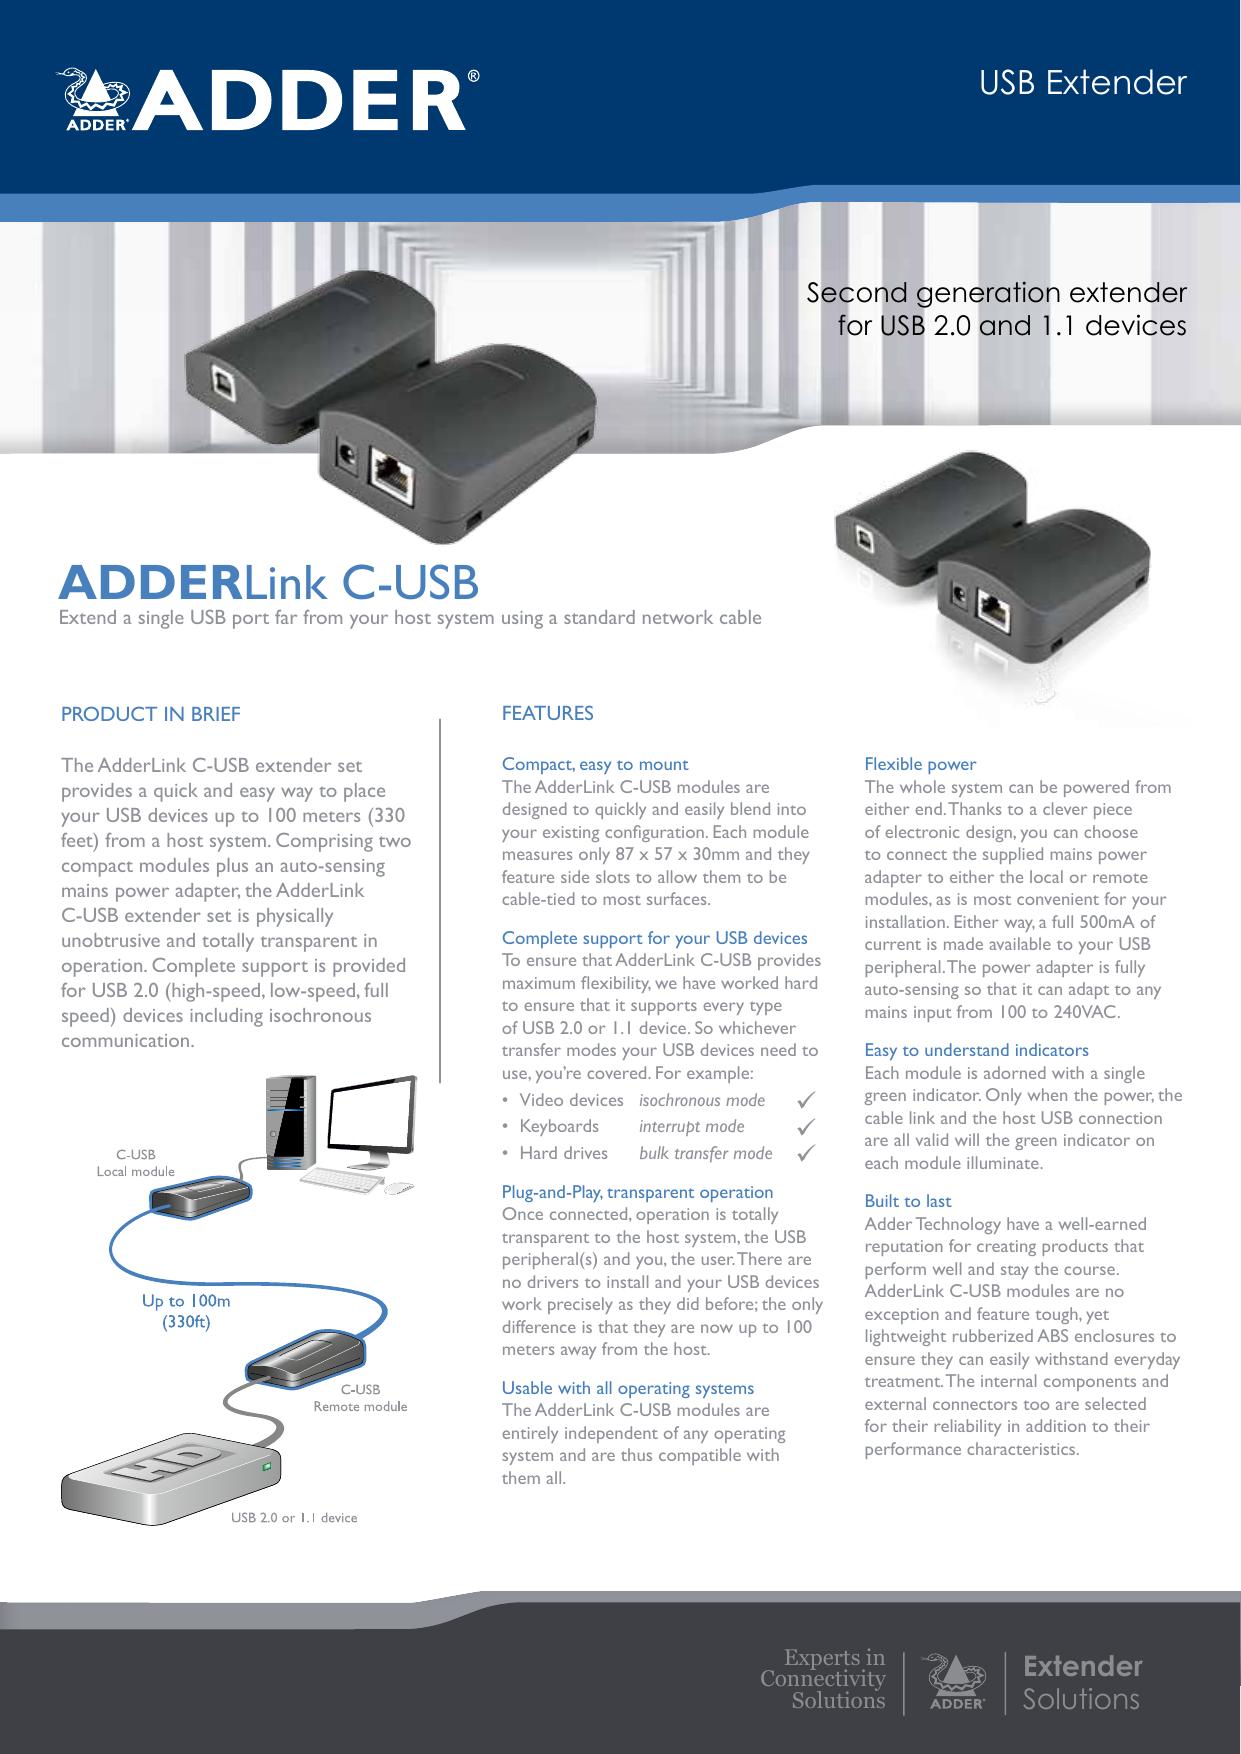 ADDERLink C-USB - procom | manualzz com